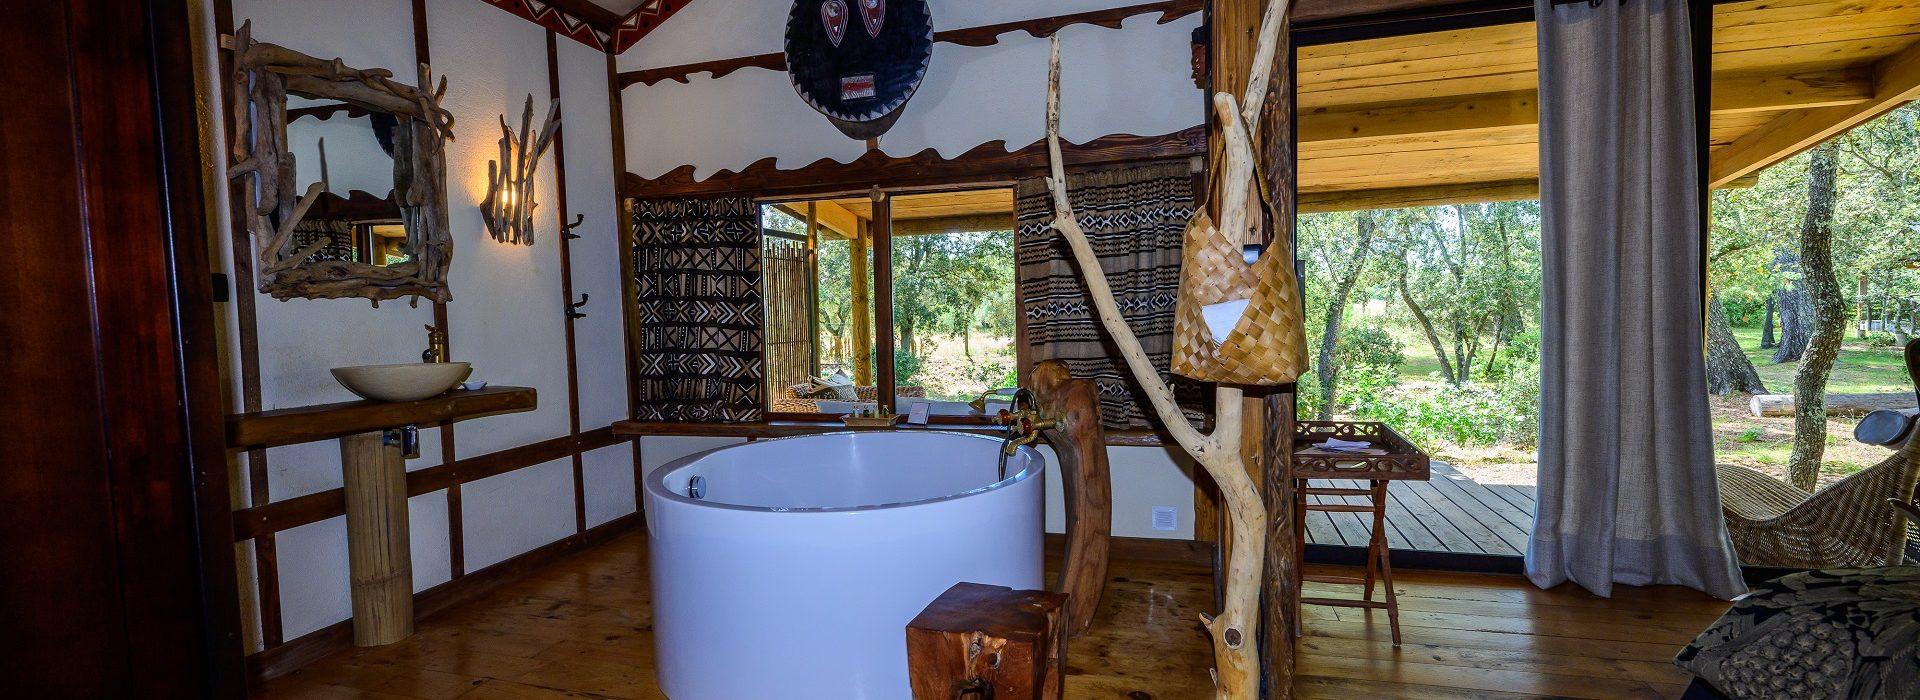 Safari lodge africain luxe